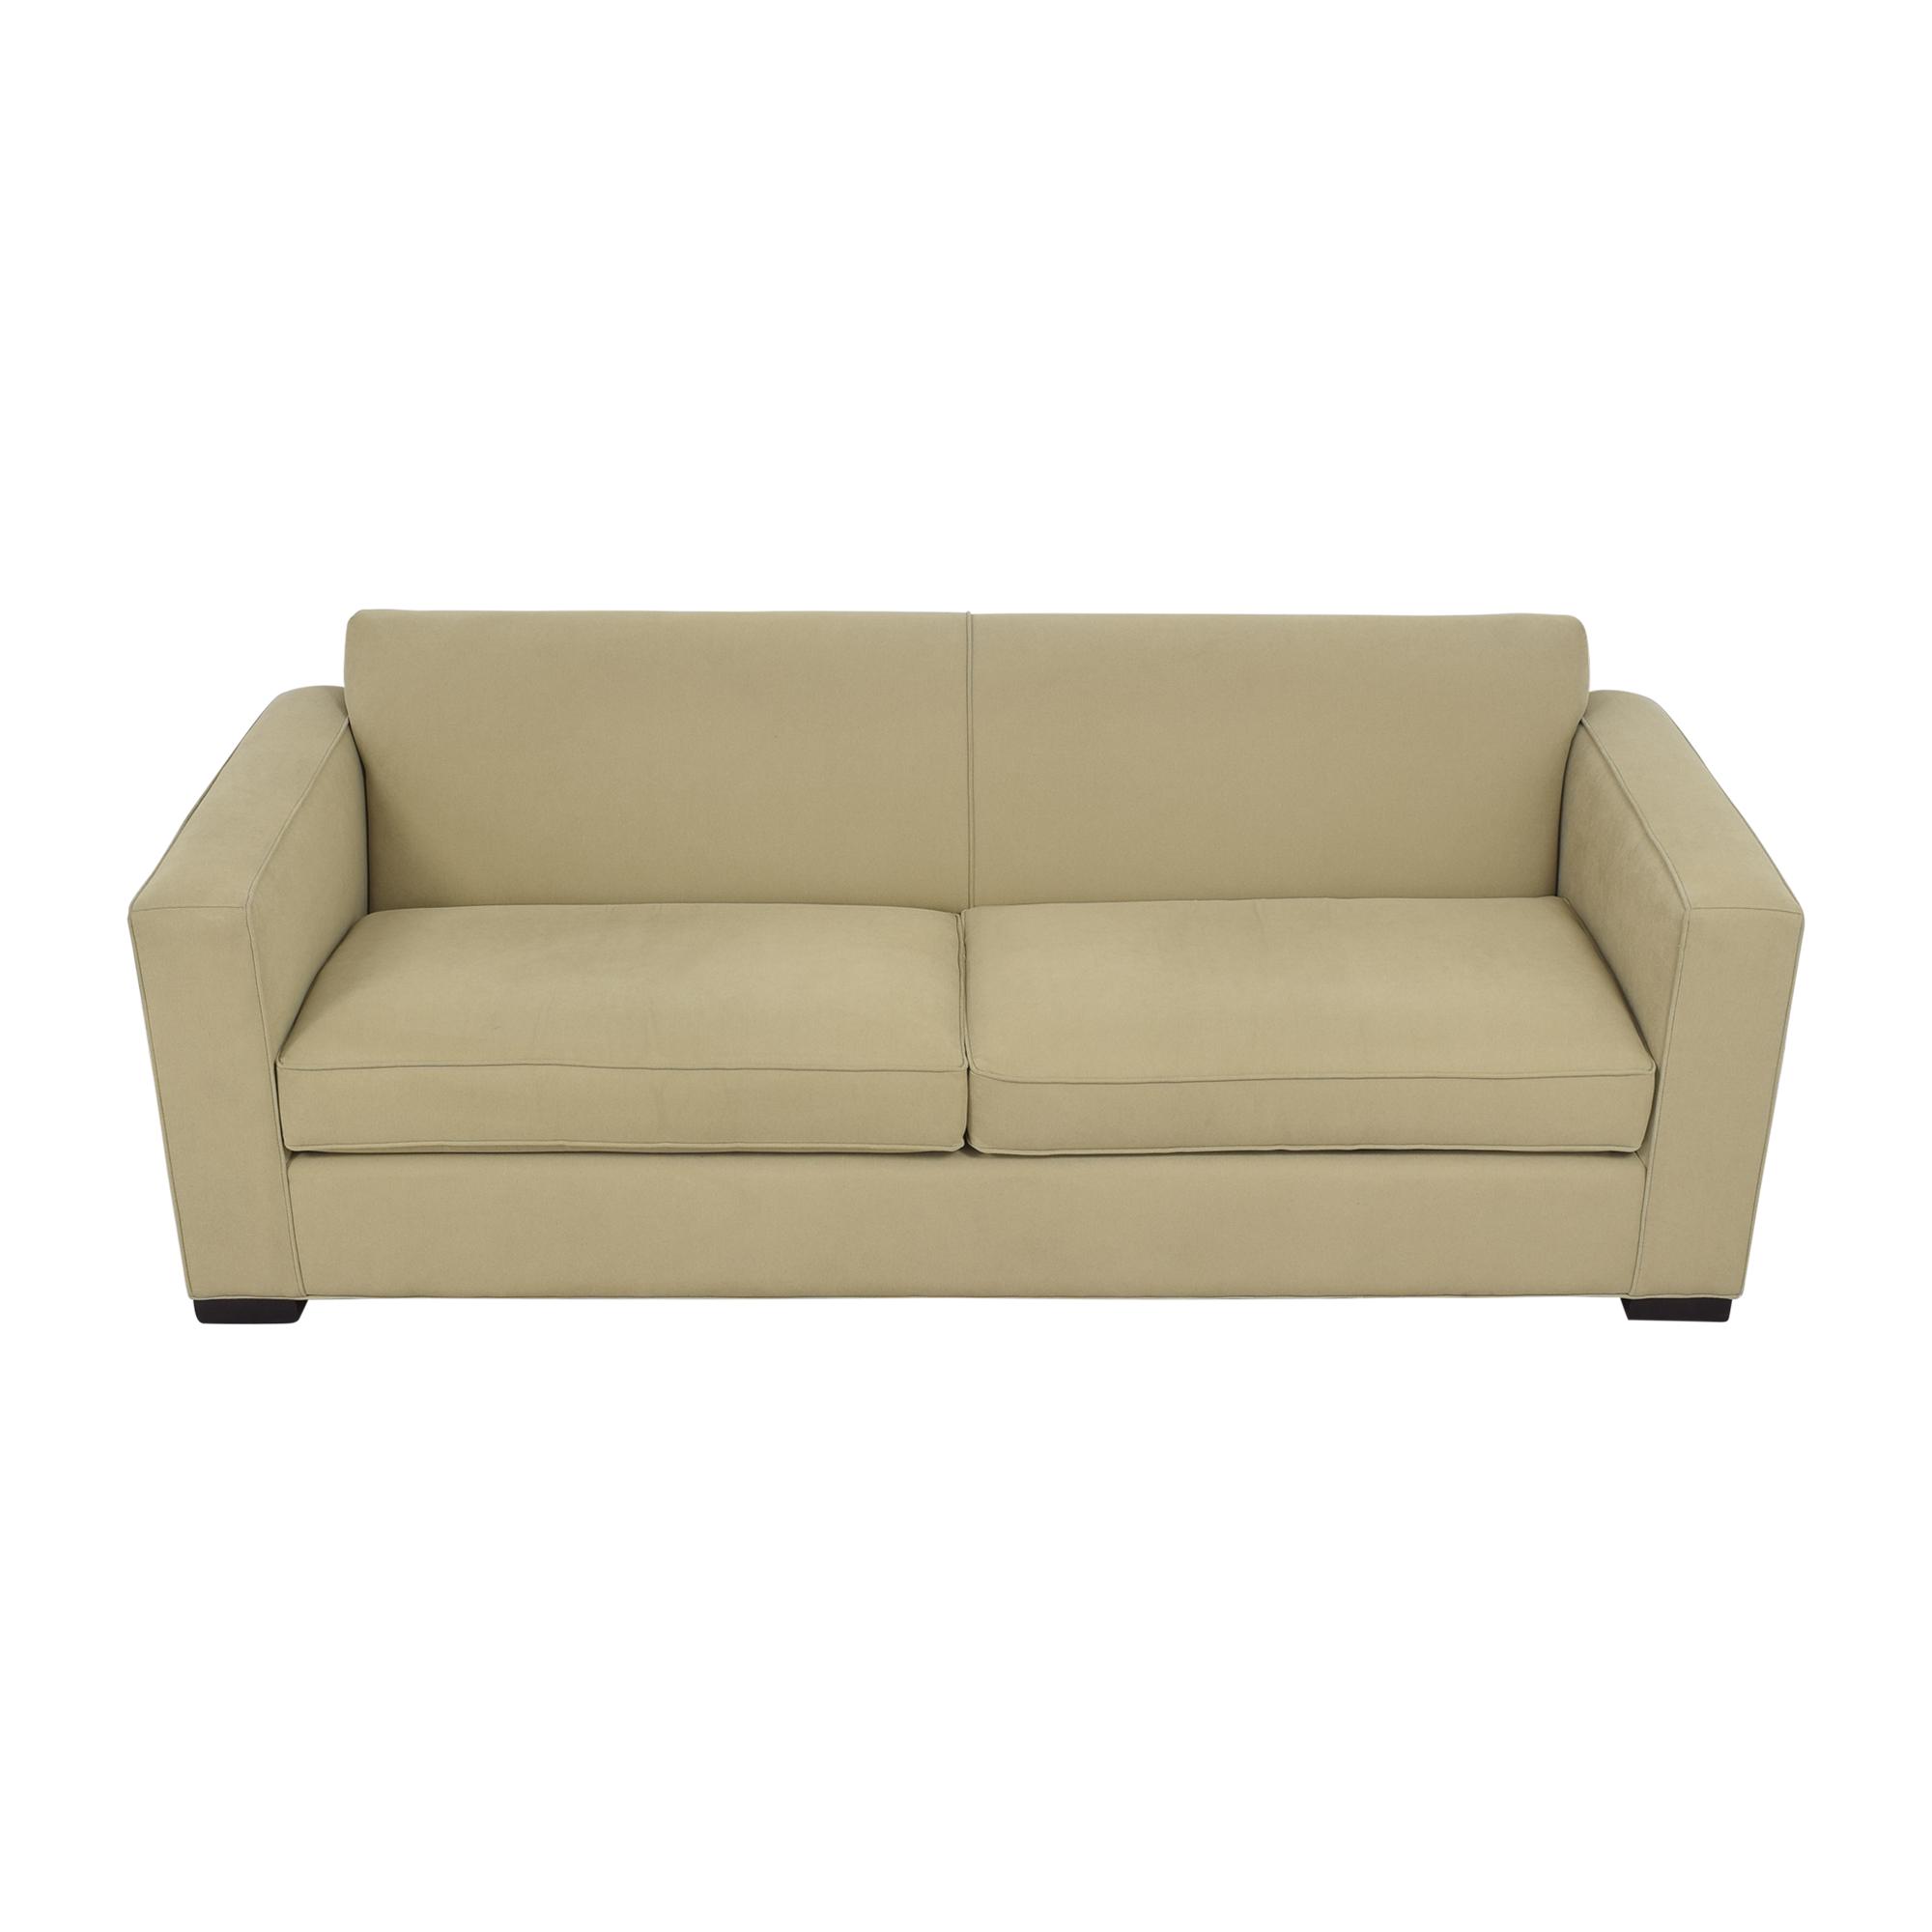 Room & Board Room & Board Ian Two Cushion Sofa dimensions